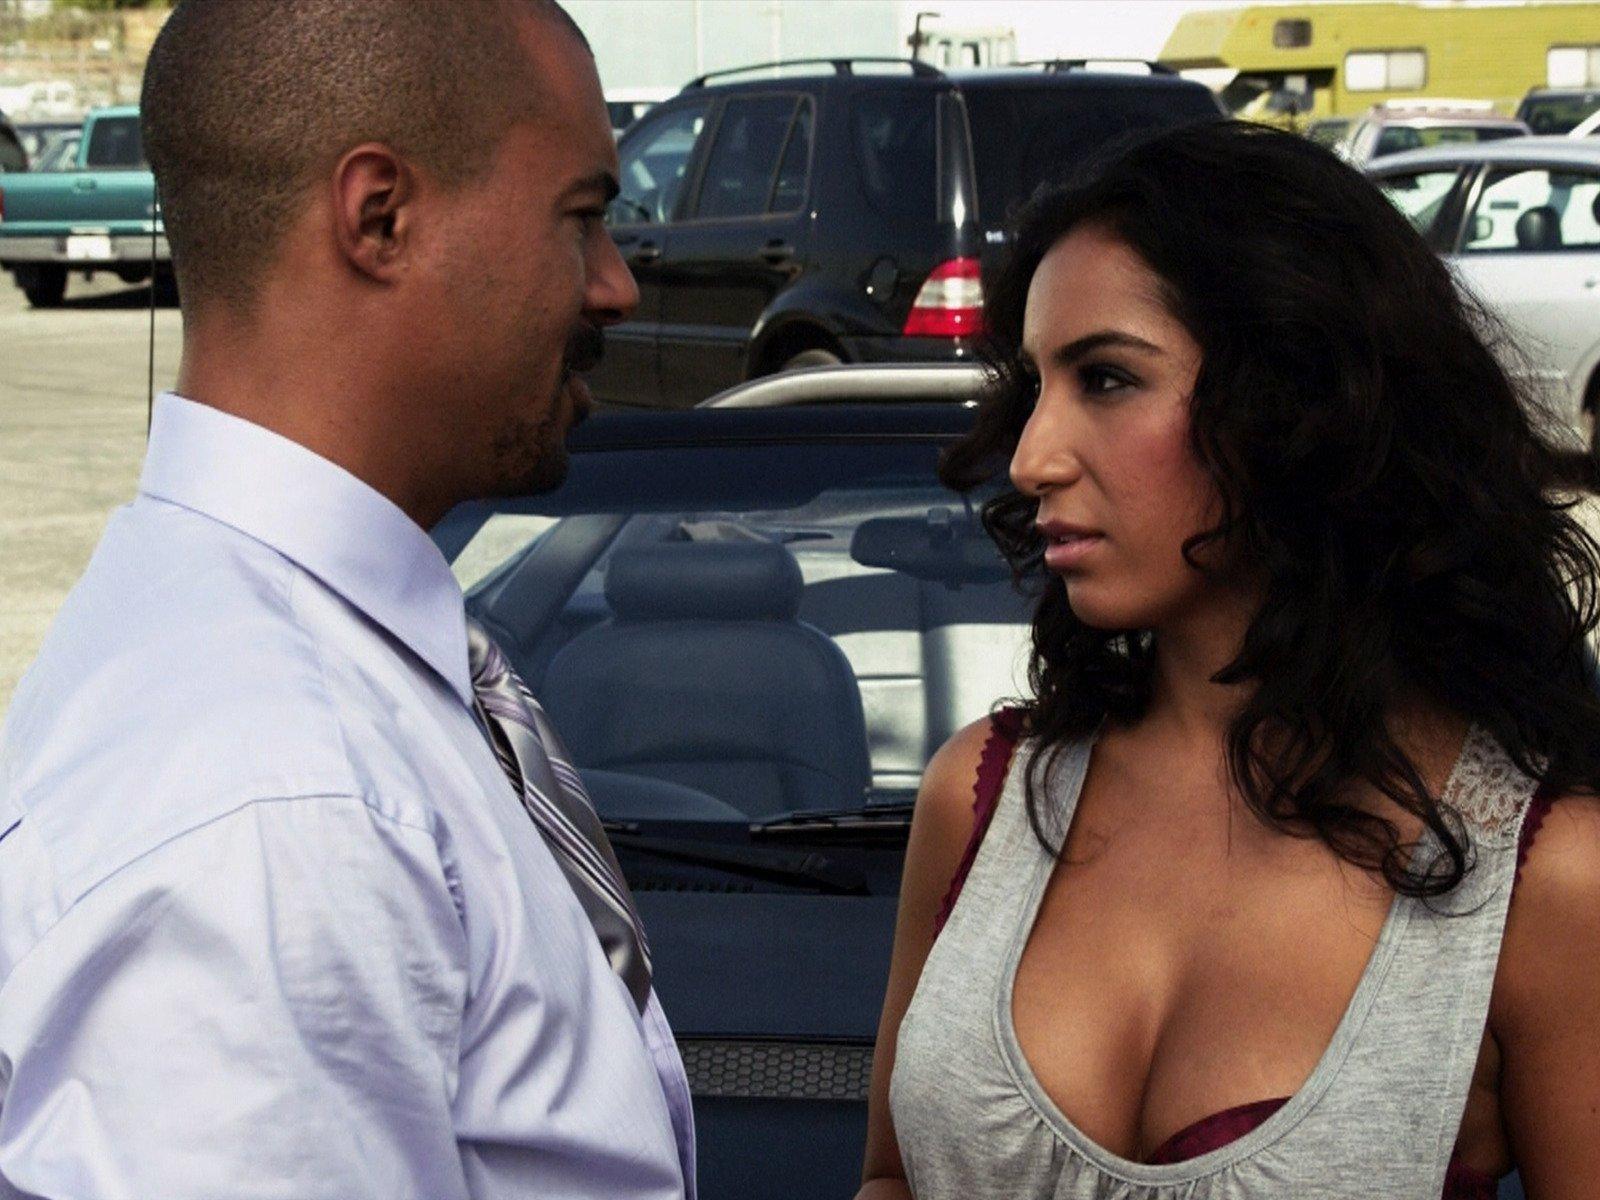 Amazon.com: Watch Zane's Sex Chronicles Features - Season 2 | Prime Video